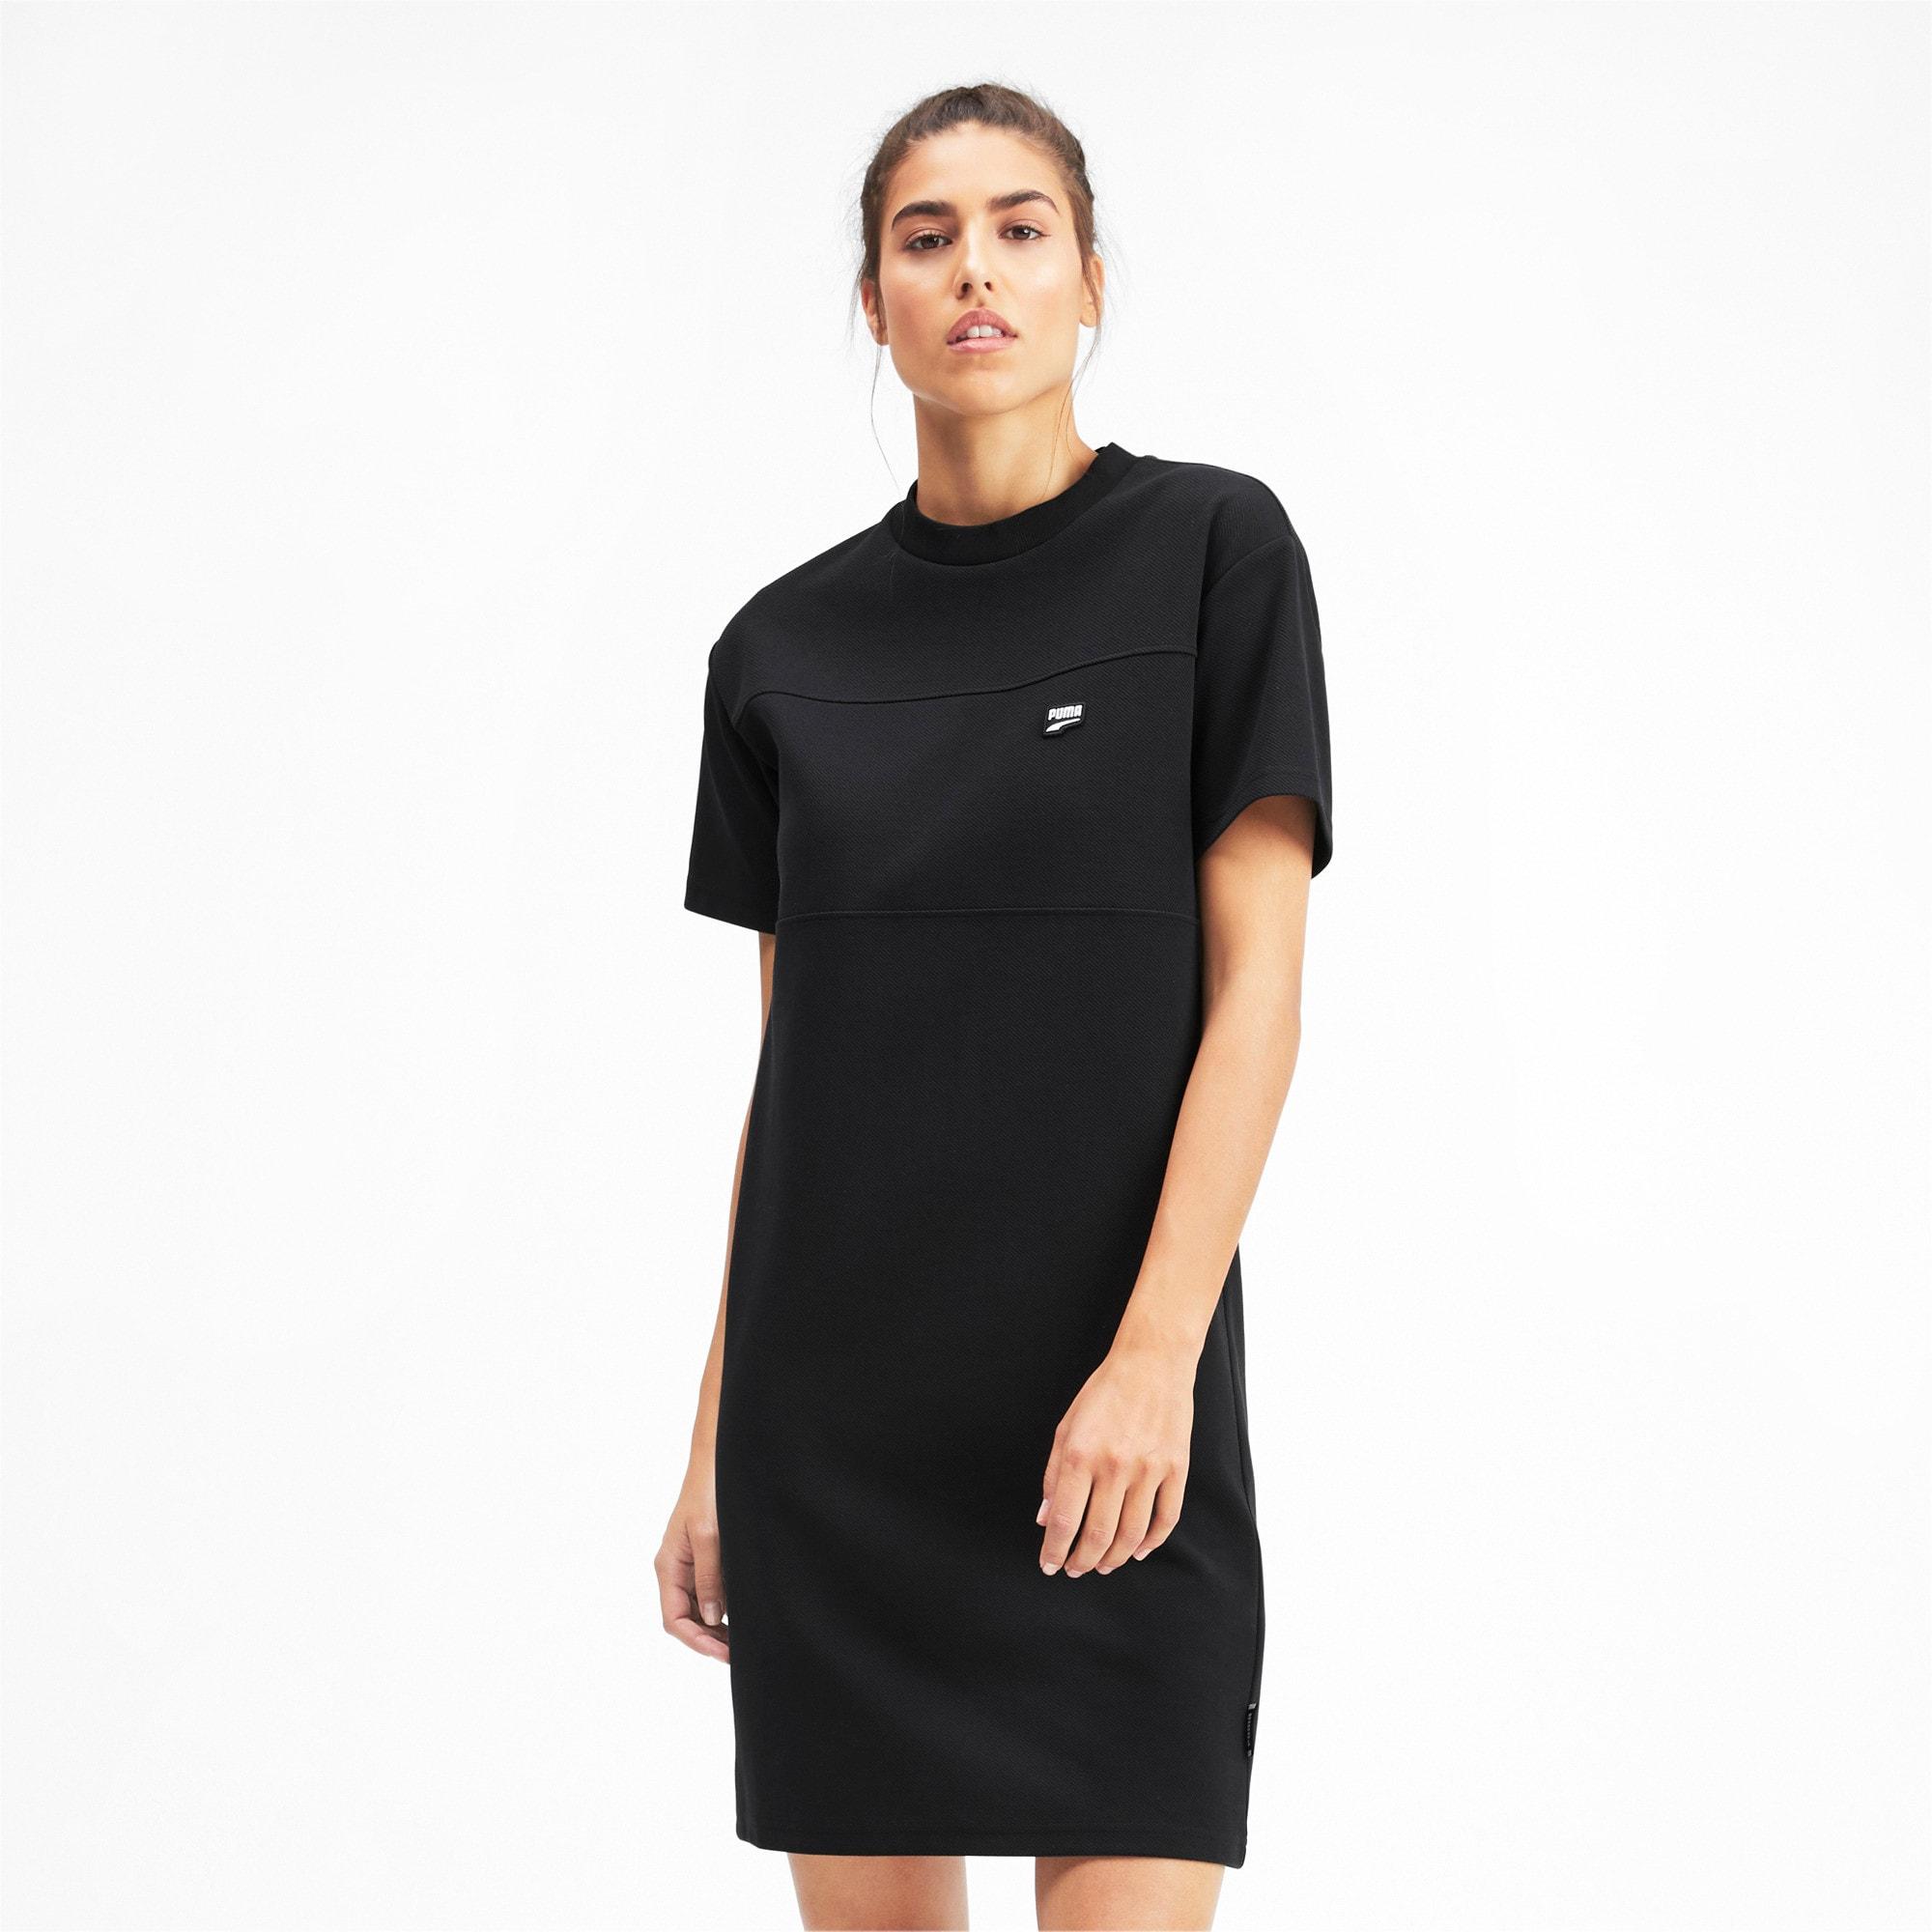 Miniatura 1 de Vestido Downtown para mujer, Puma Black, mediano